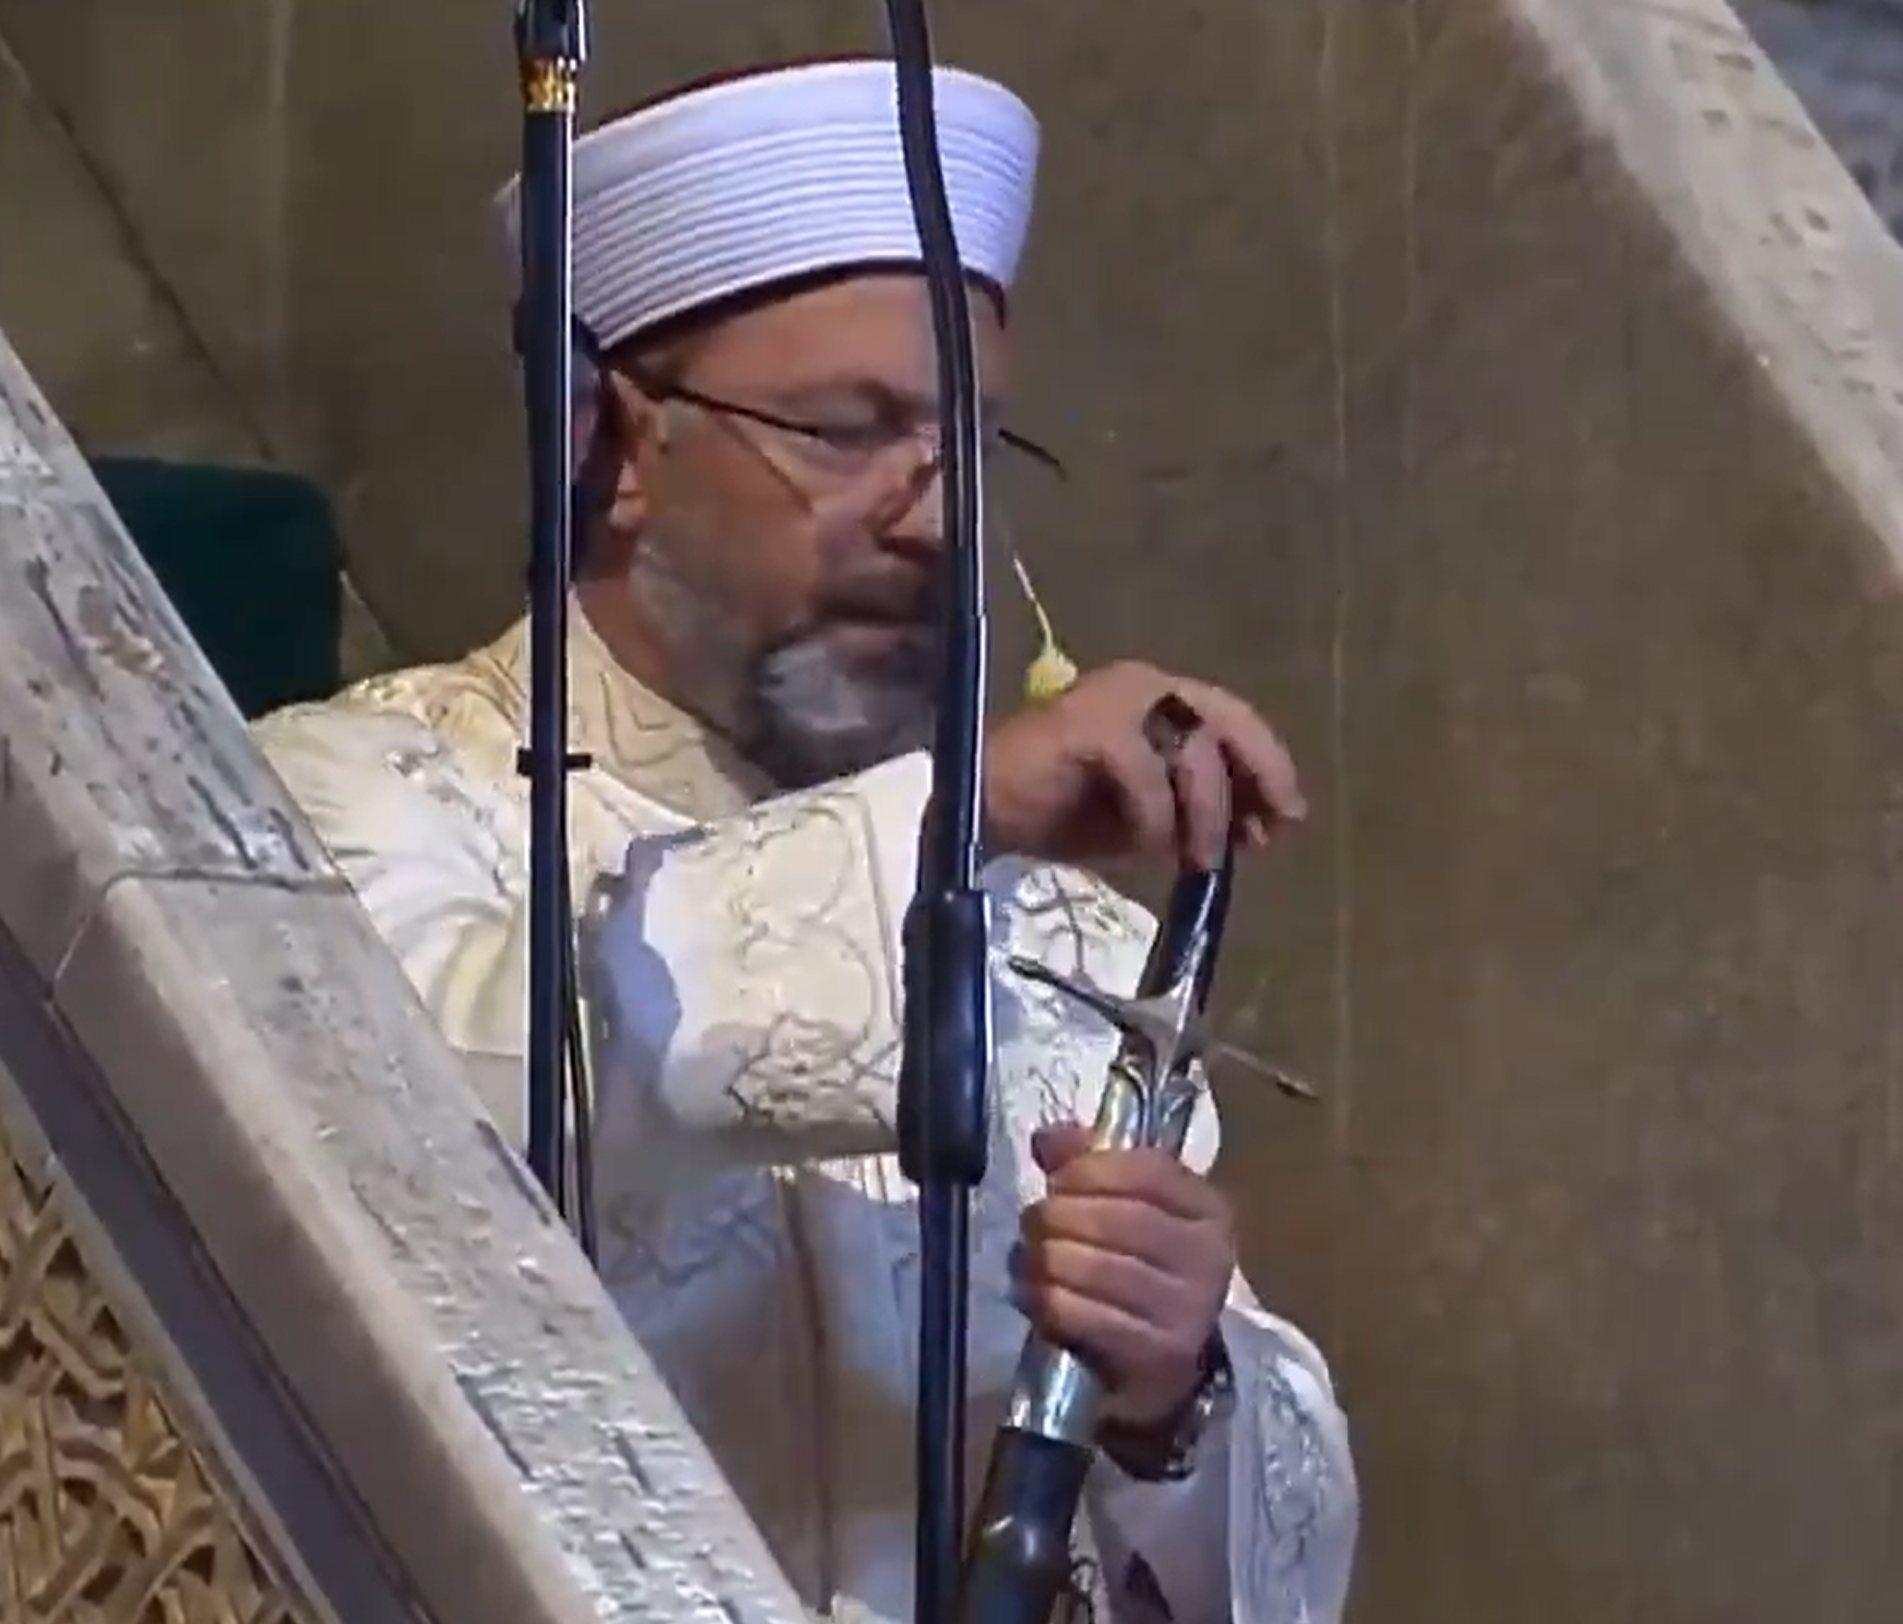 Hagia Sophia Friday prayer: full transcript of the sermon